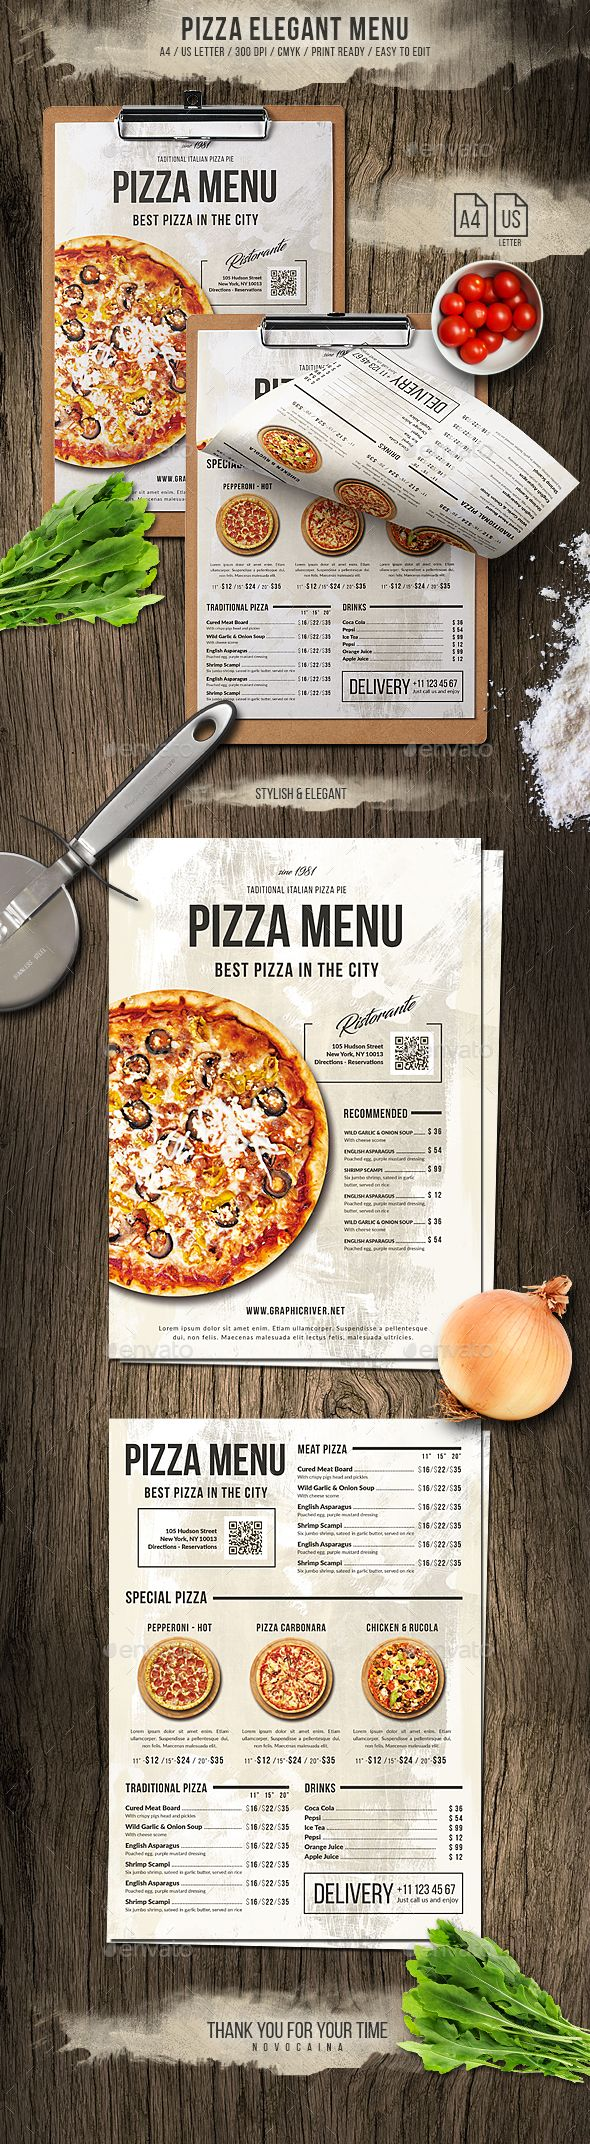 Pizza Elegant Menu - A4 and US Letter | Restaurante y Clasicos